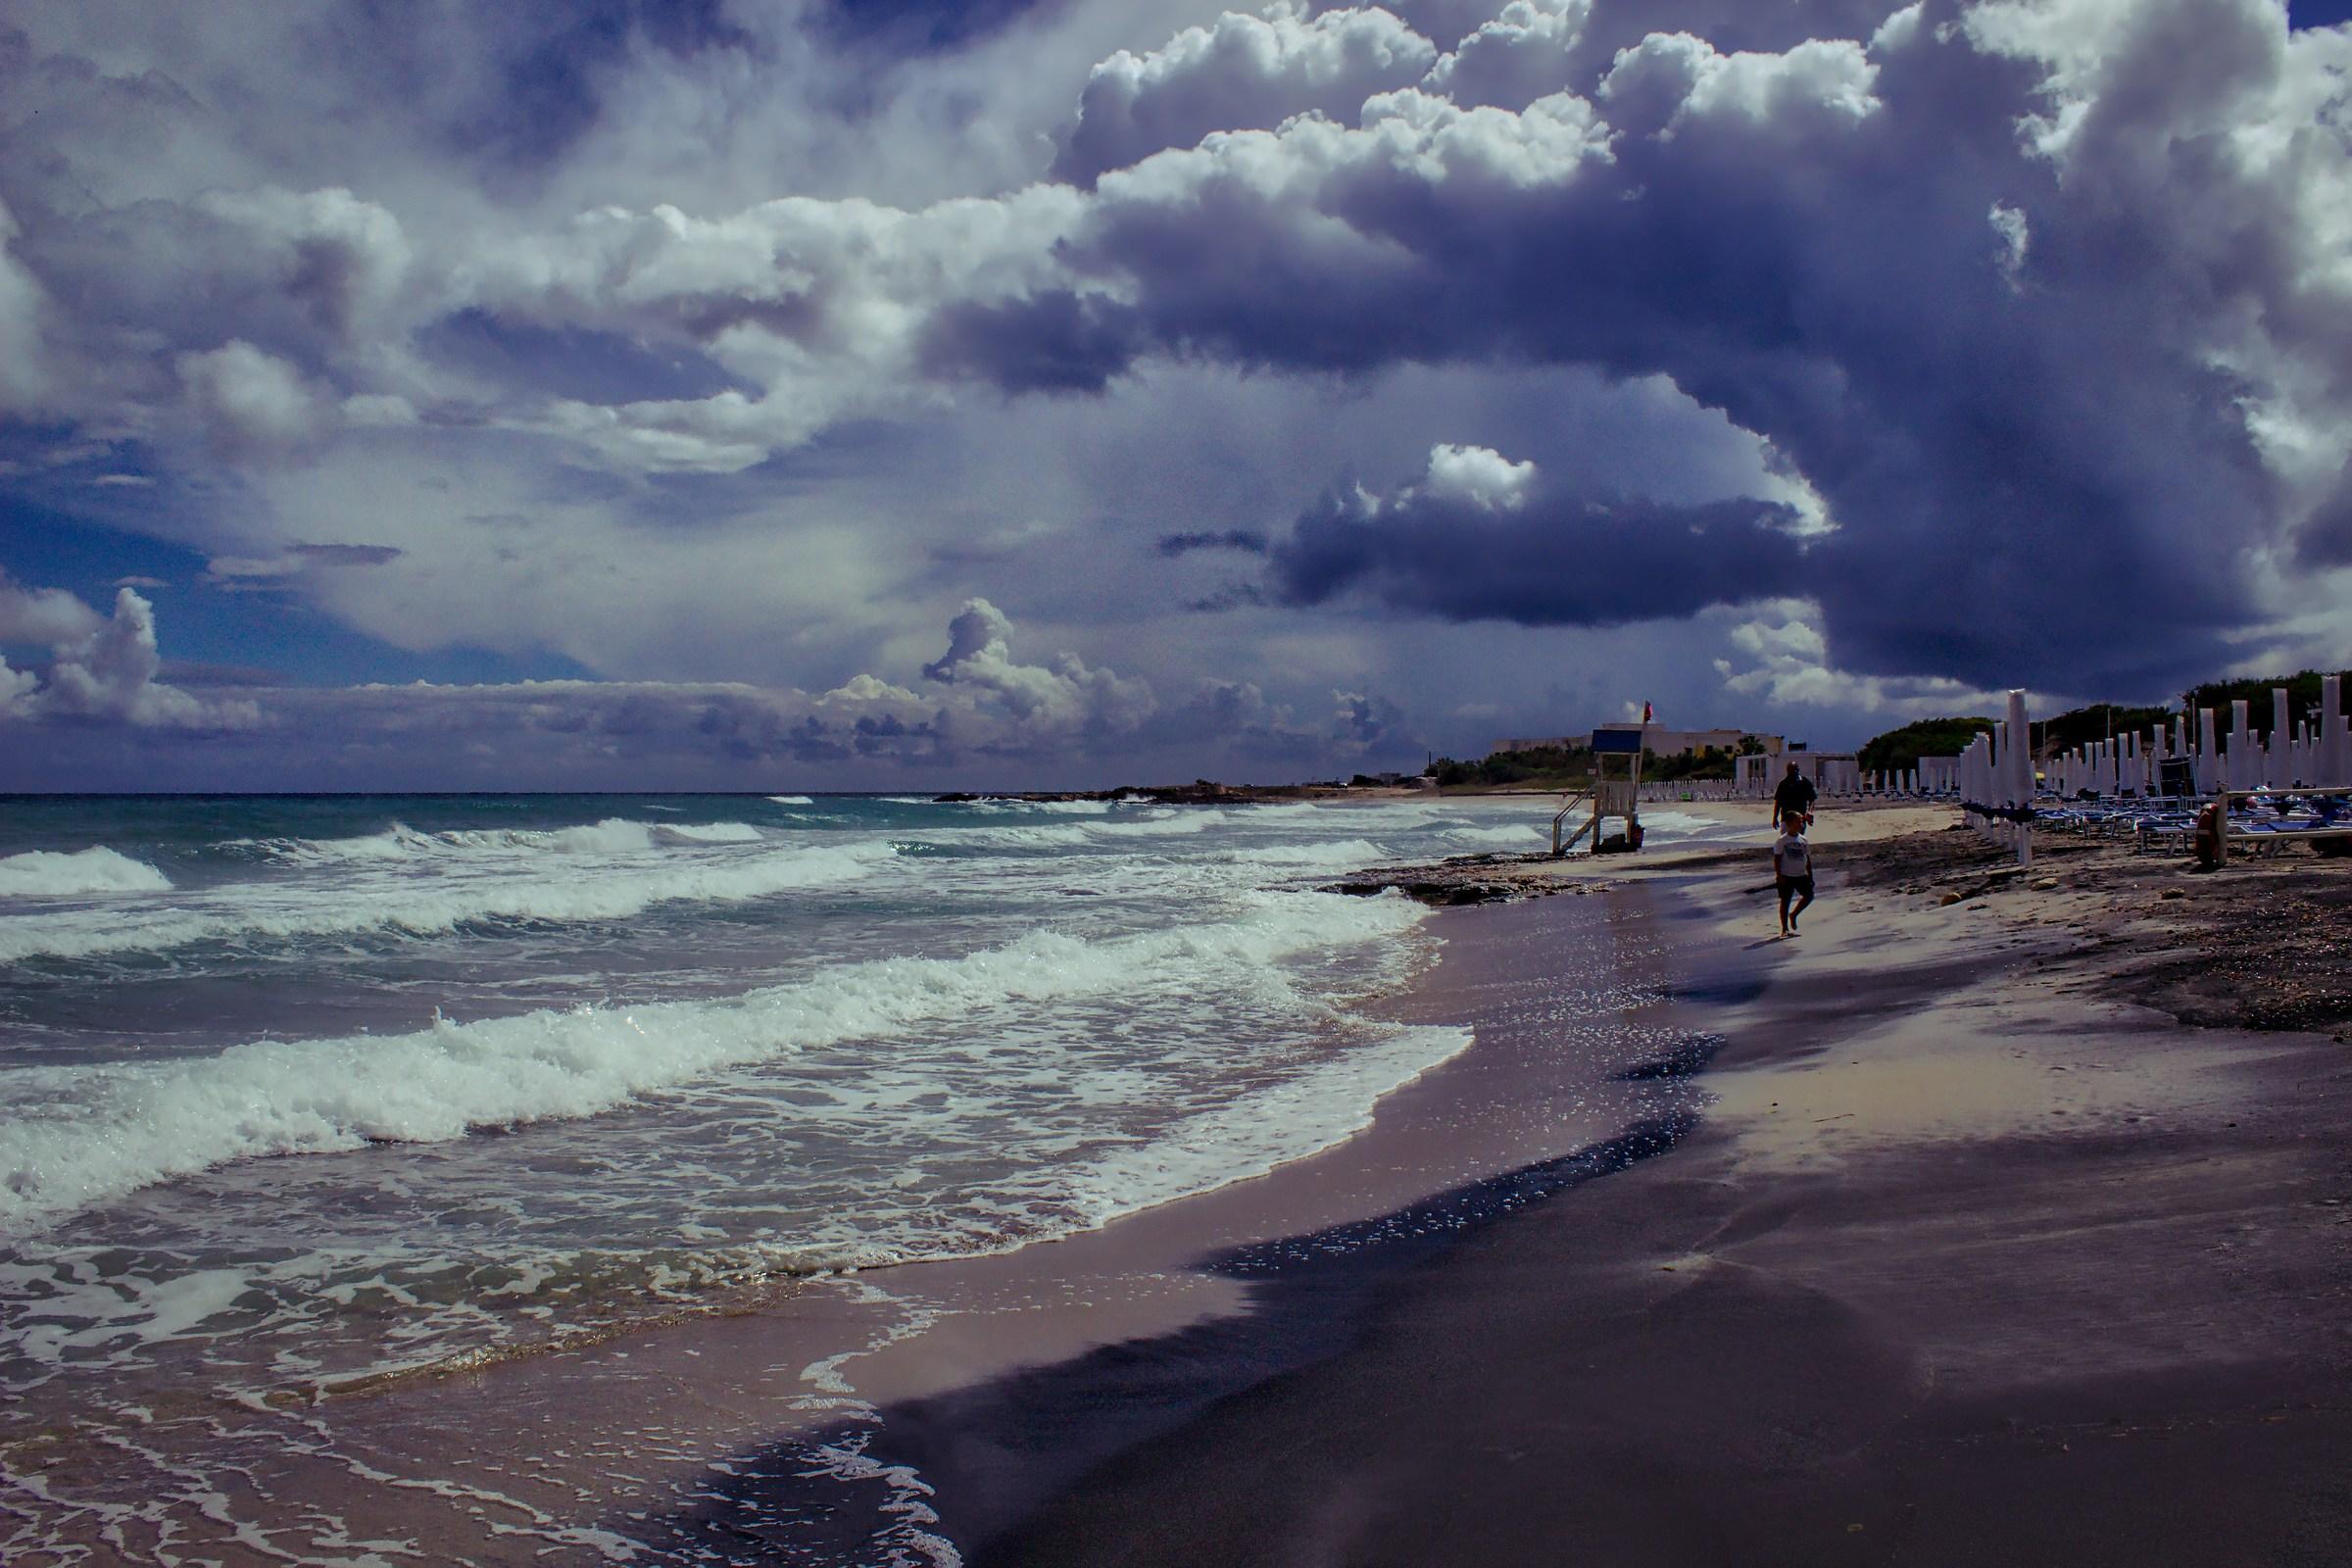 San Foca (Onde d'acqua e tsunami di nuvole)...